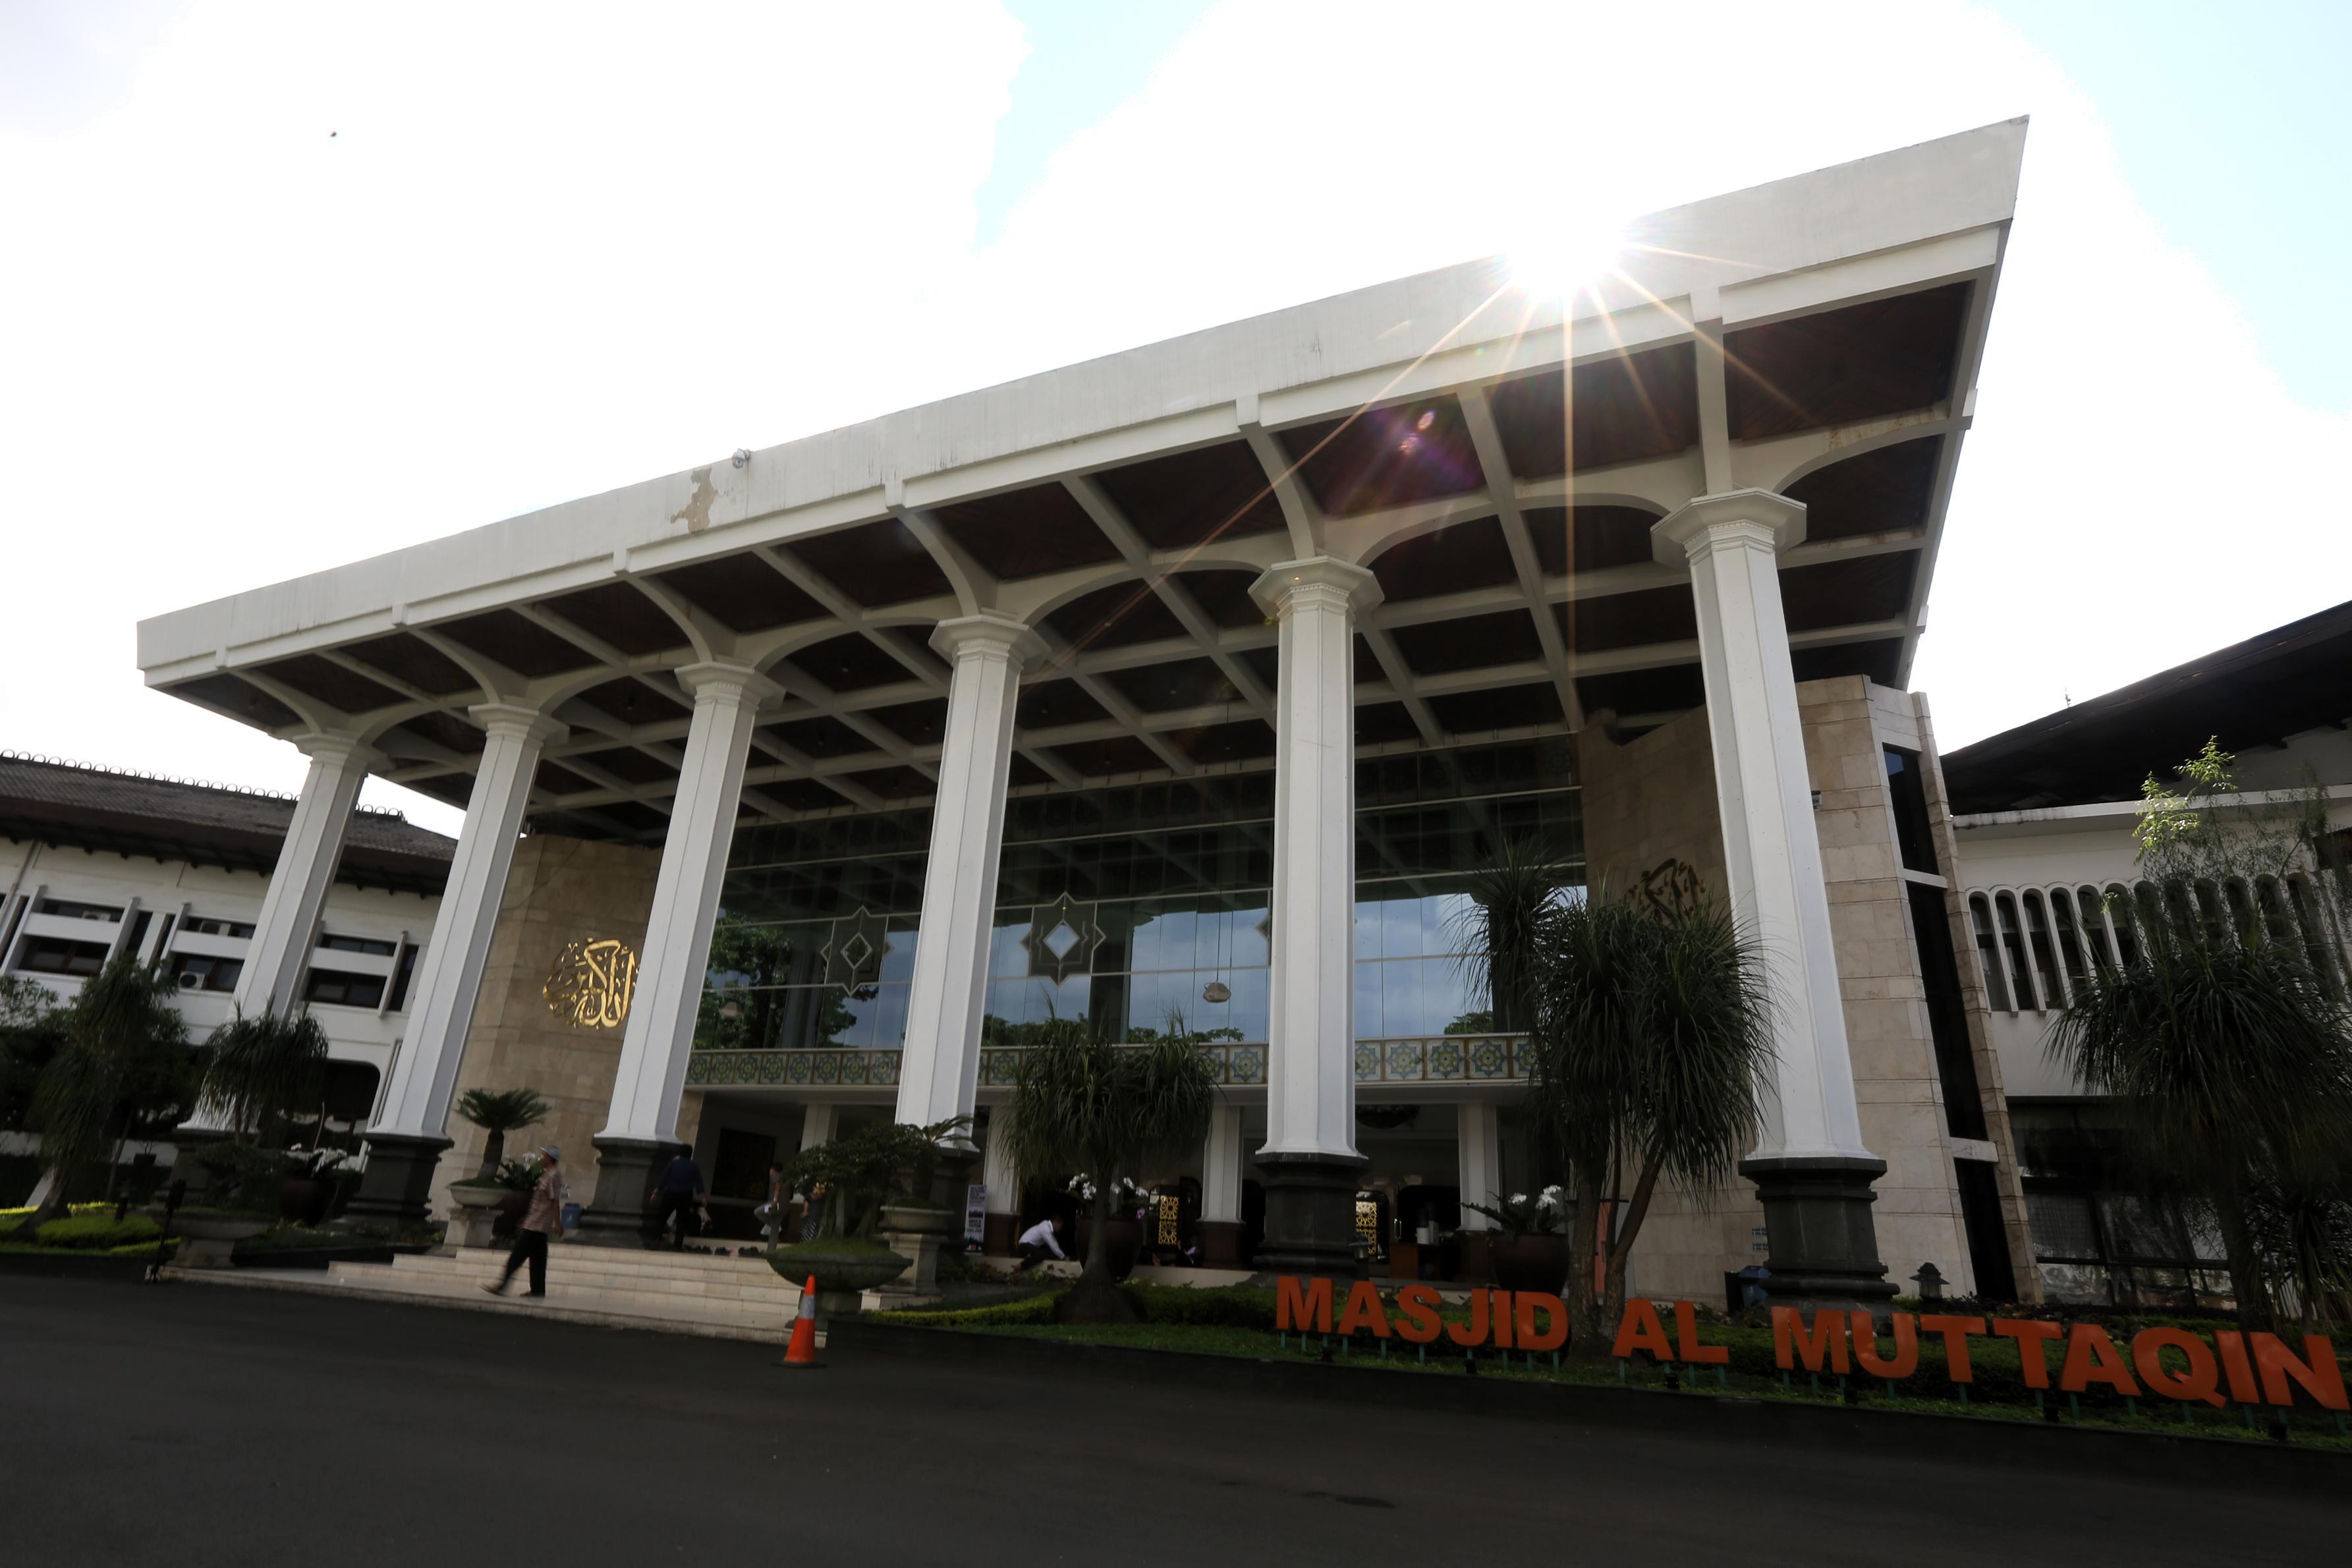 Masjid Gedung Sate Jadi Pusat Kegiatan Keagamaan Pemprov Jabar Jalan